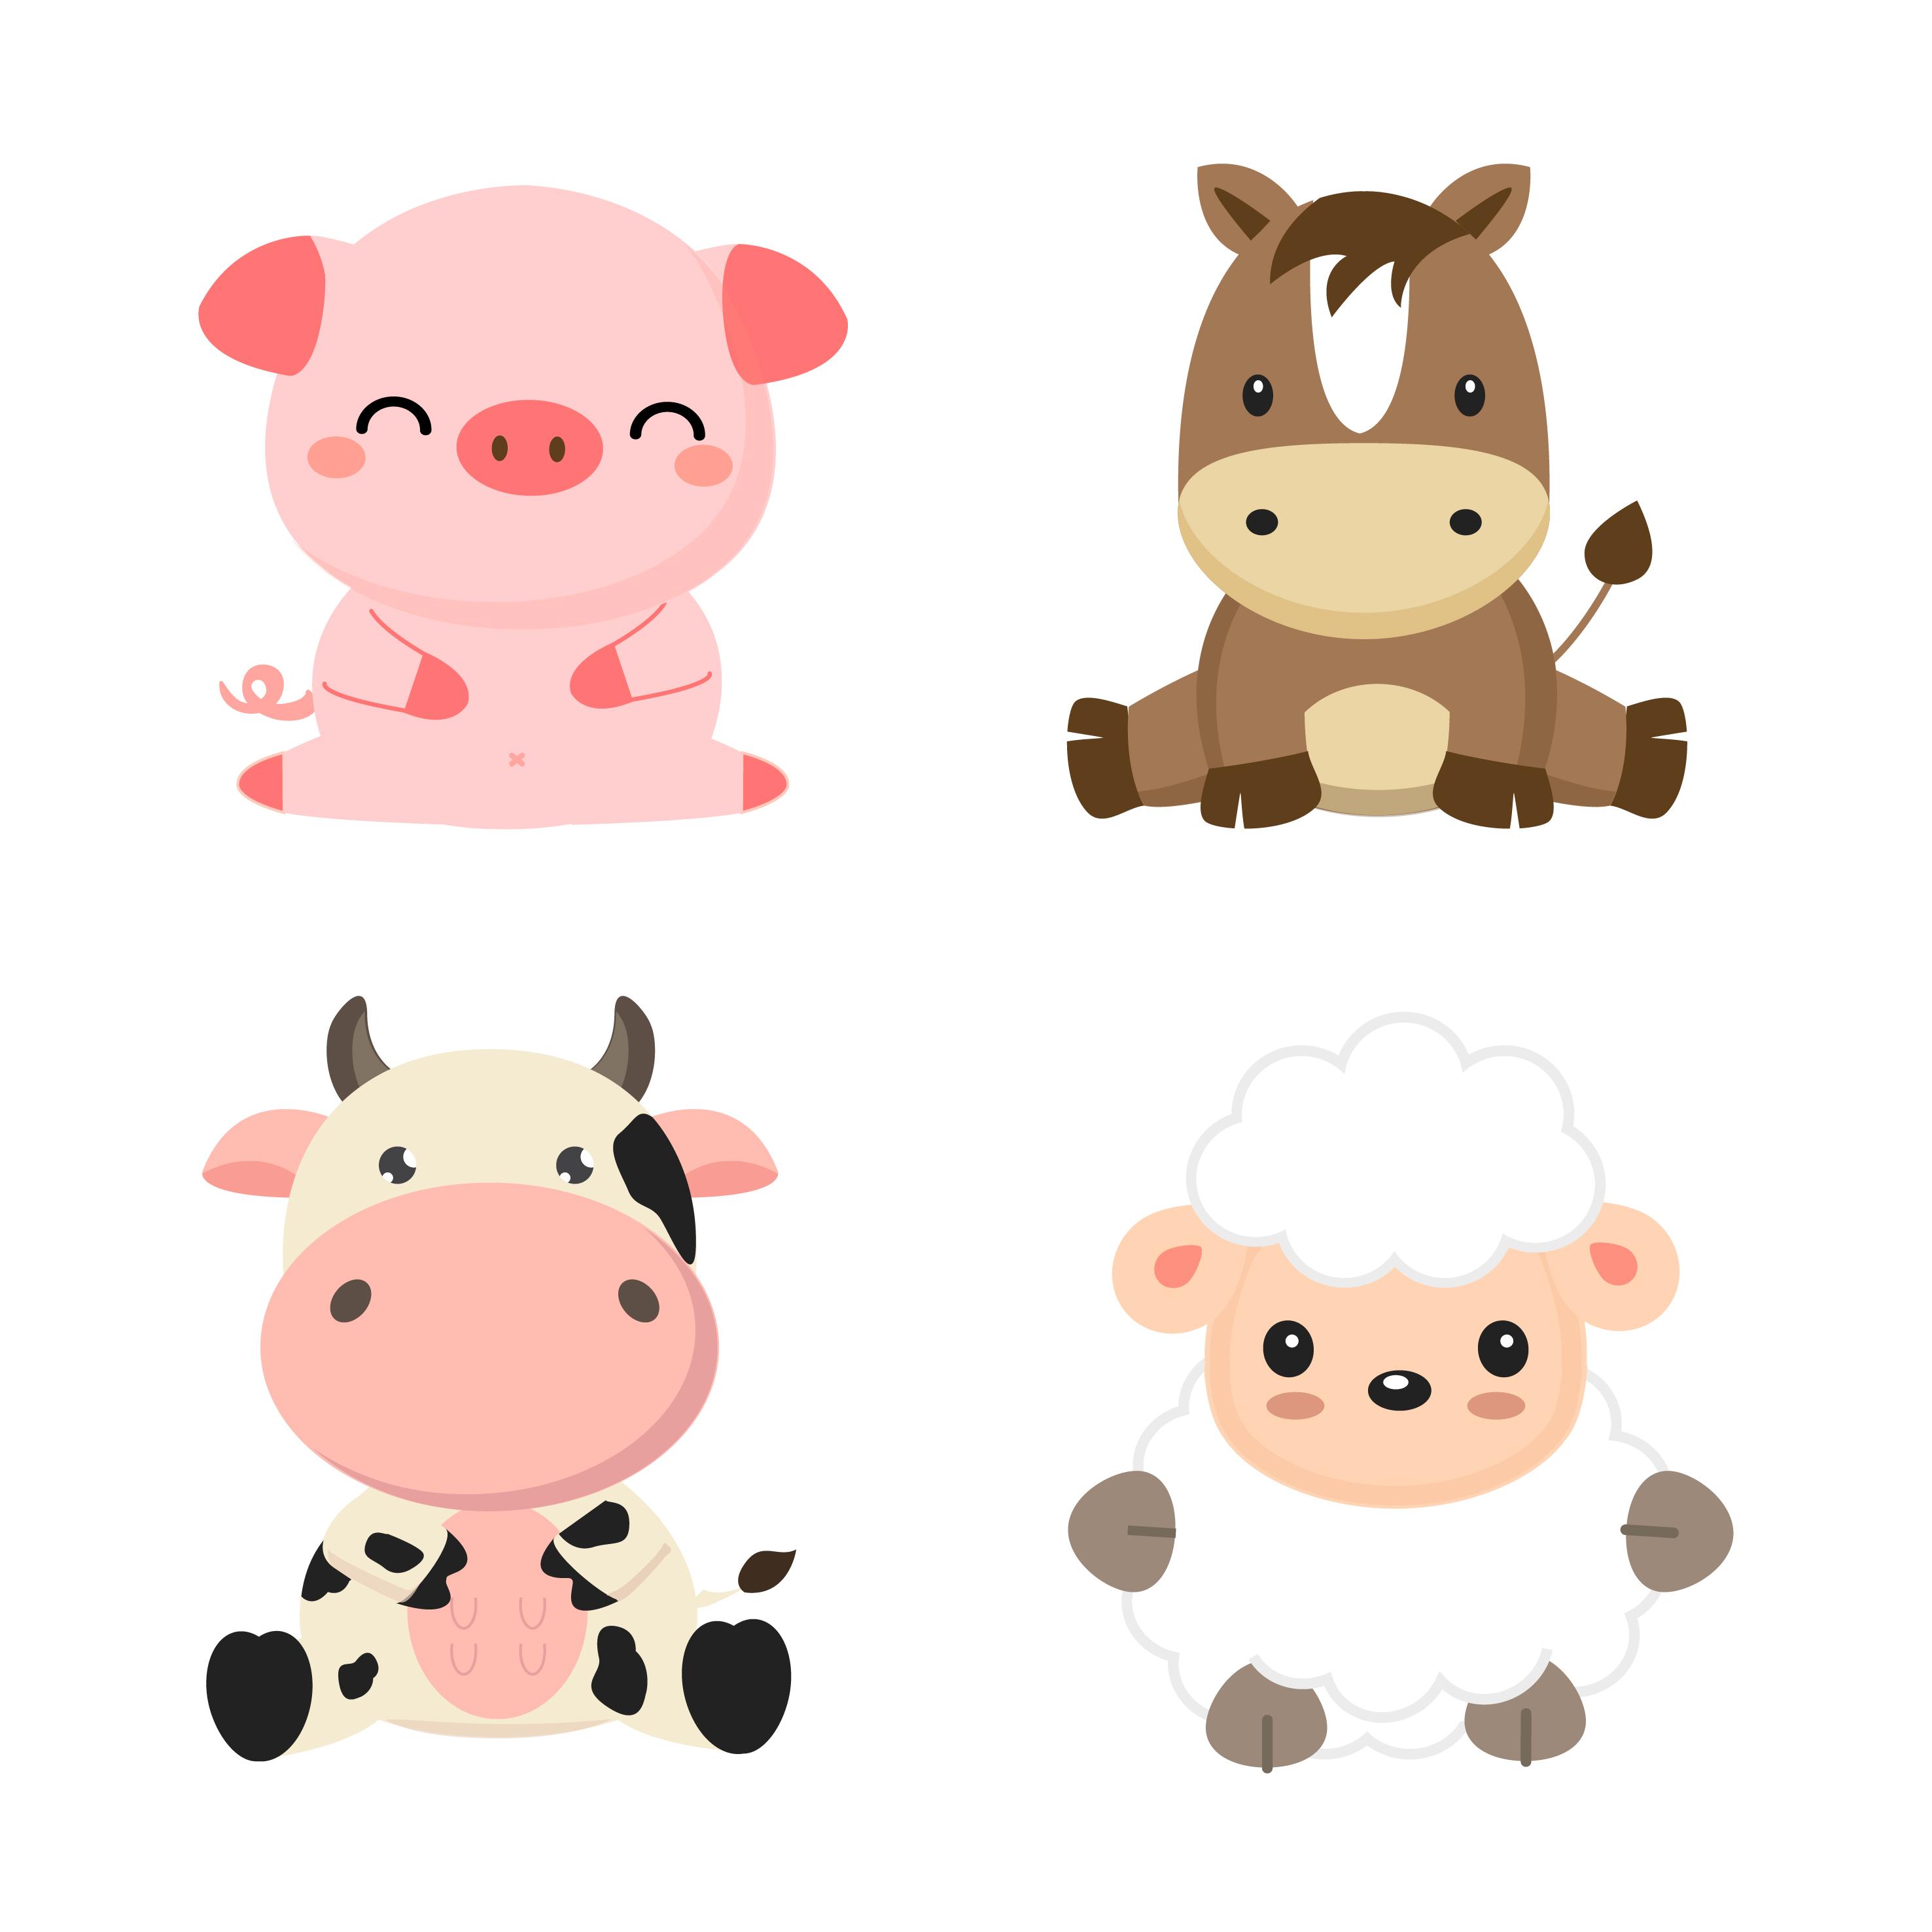 Cute Farm Animals Cow Pig Sheep And Horse Download Free Vectors Clipart Graphics Vector Art